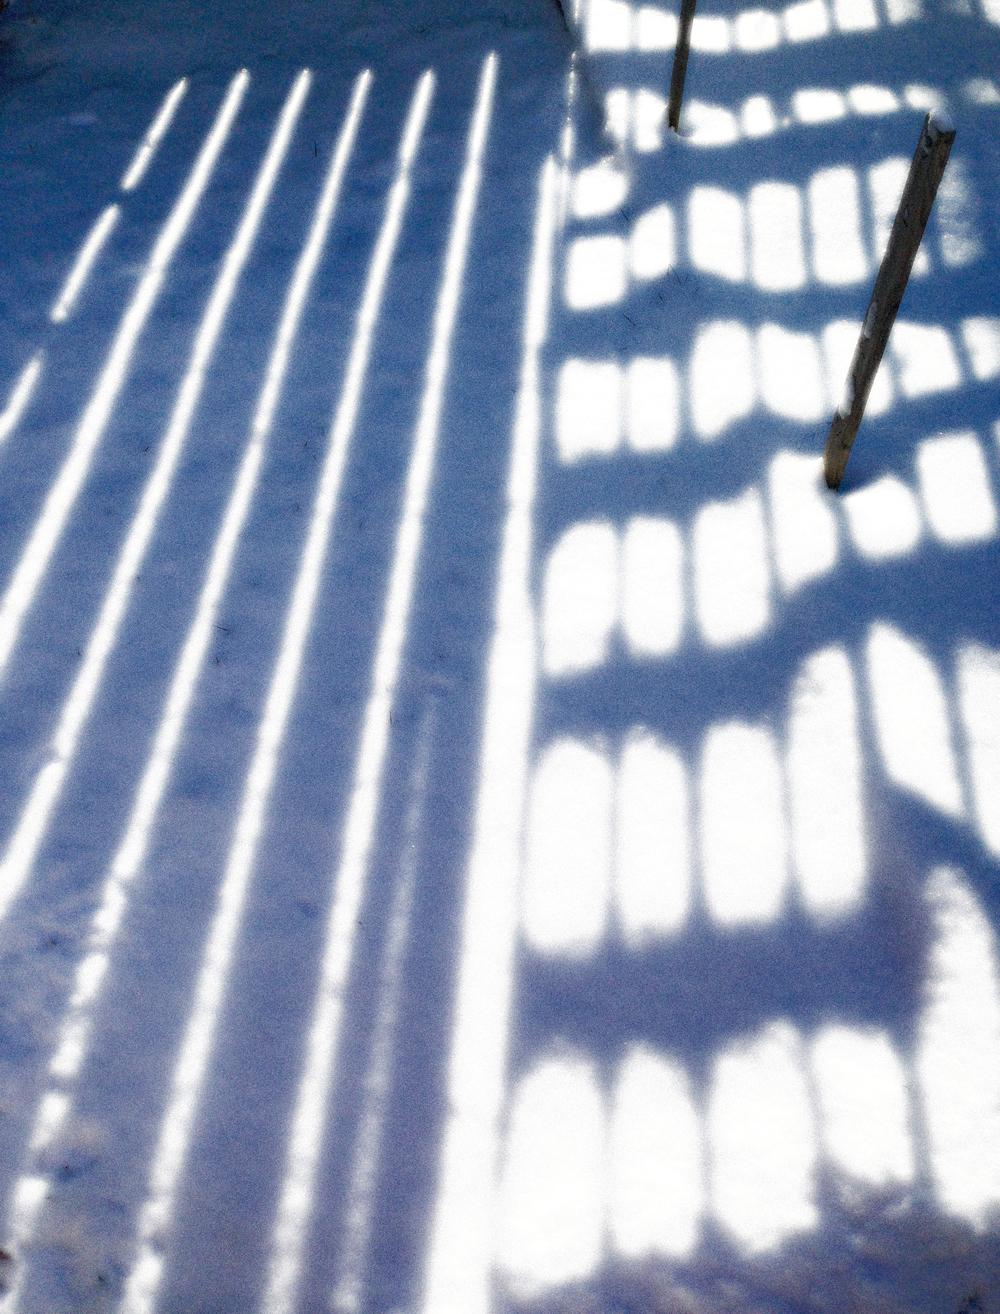 Winter Garden,VHS 2014,posted December 16,wk 25